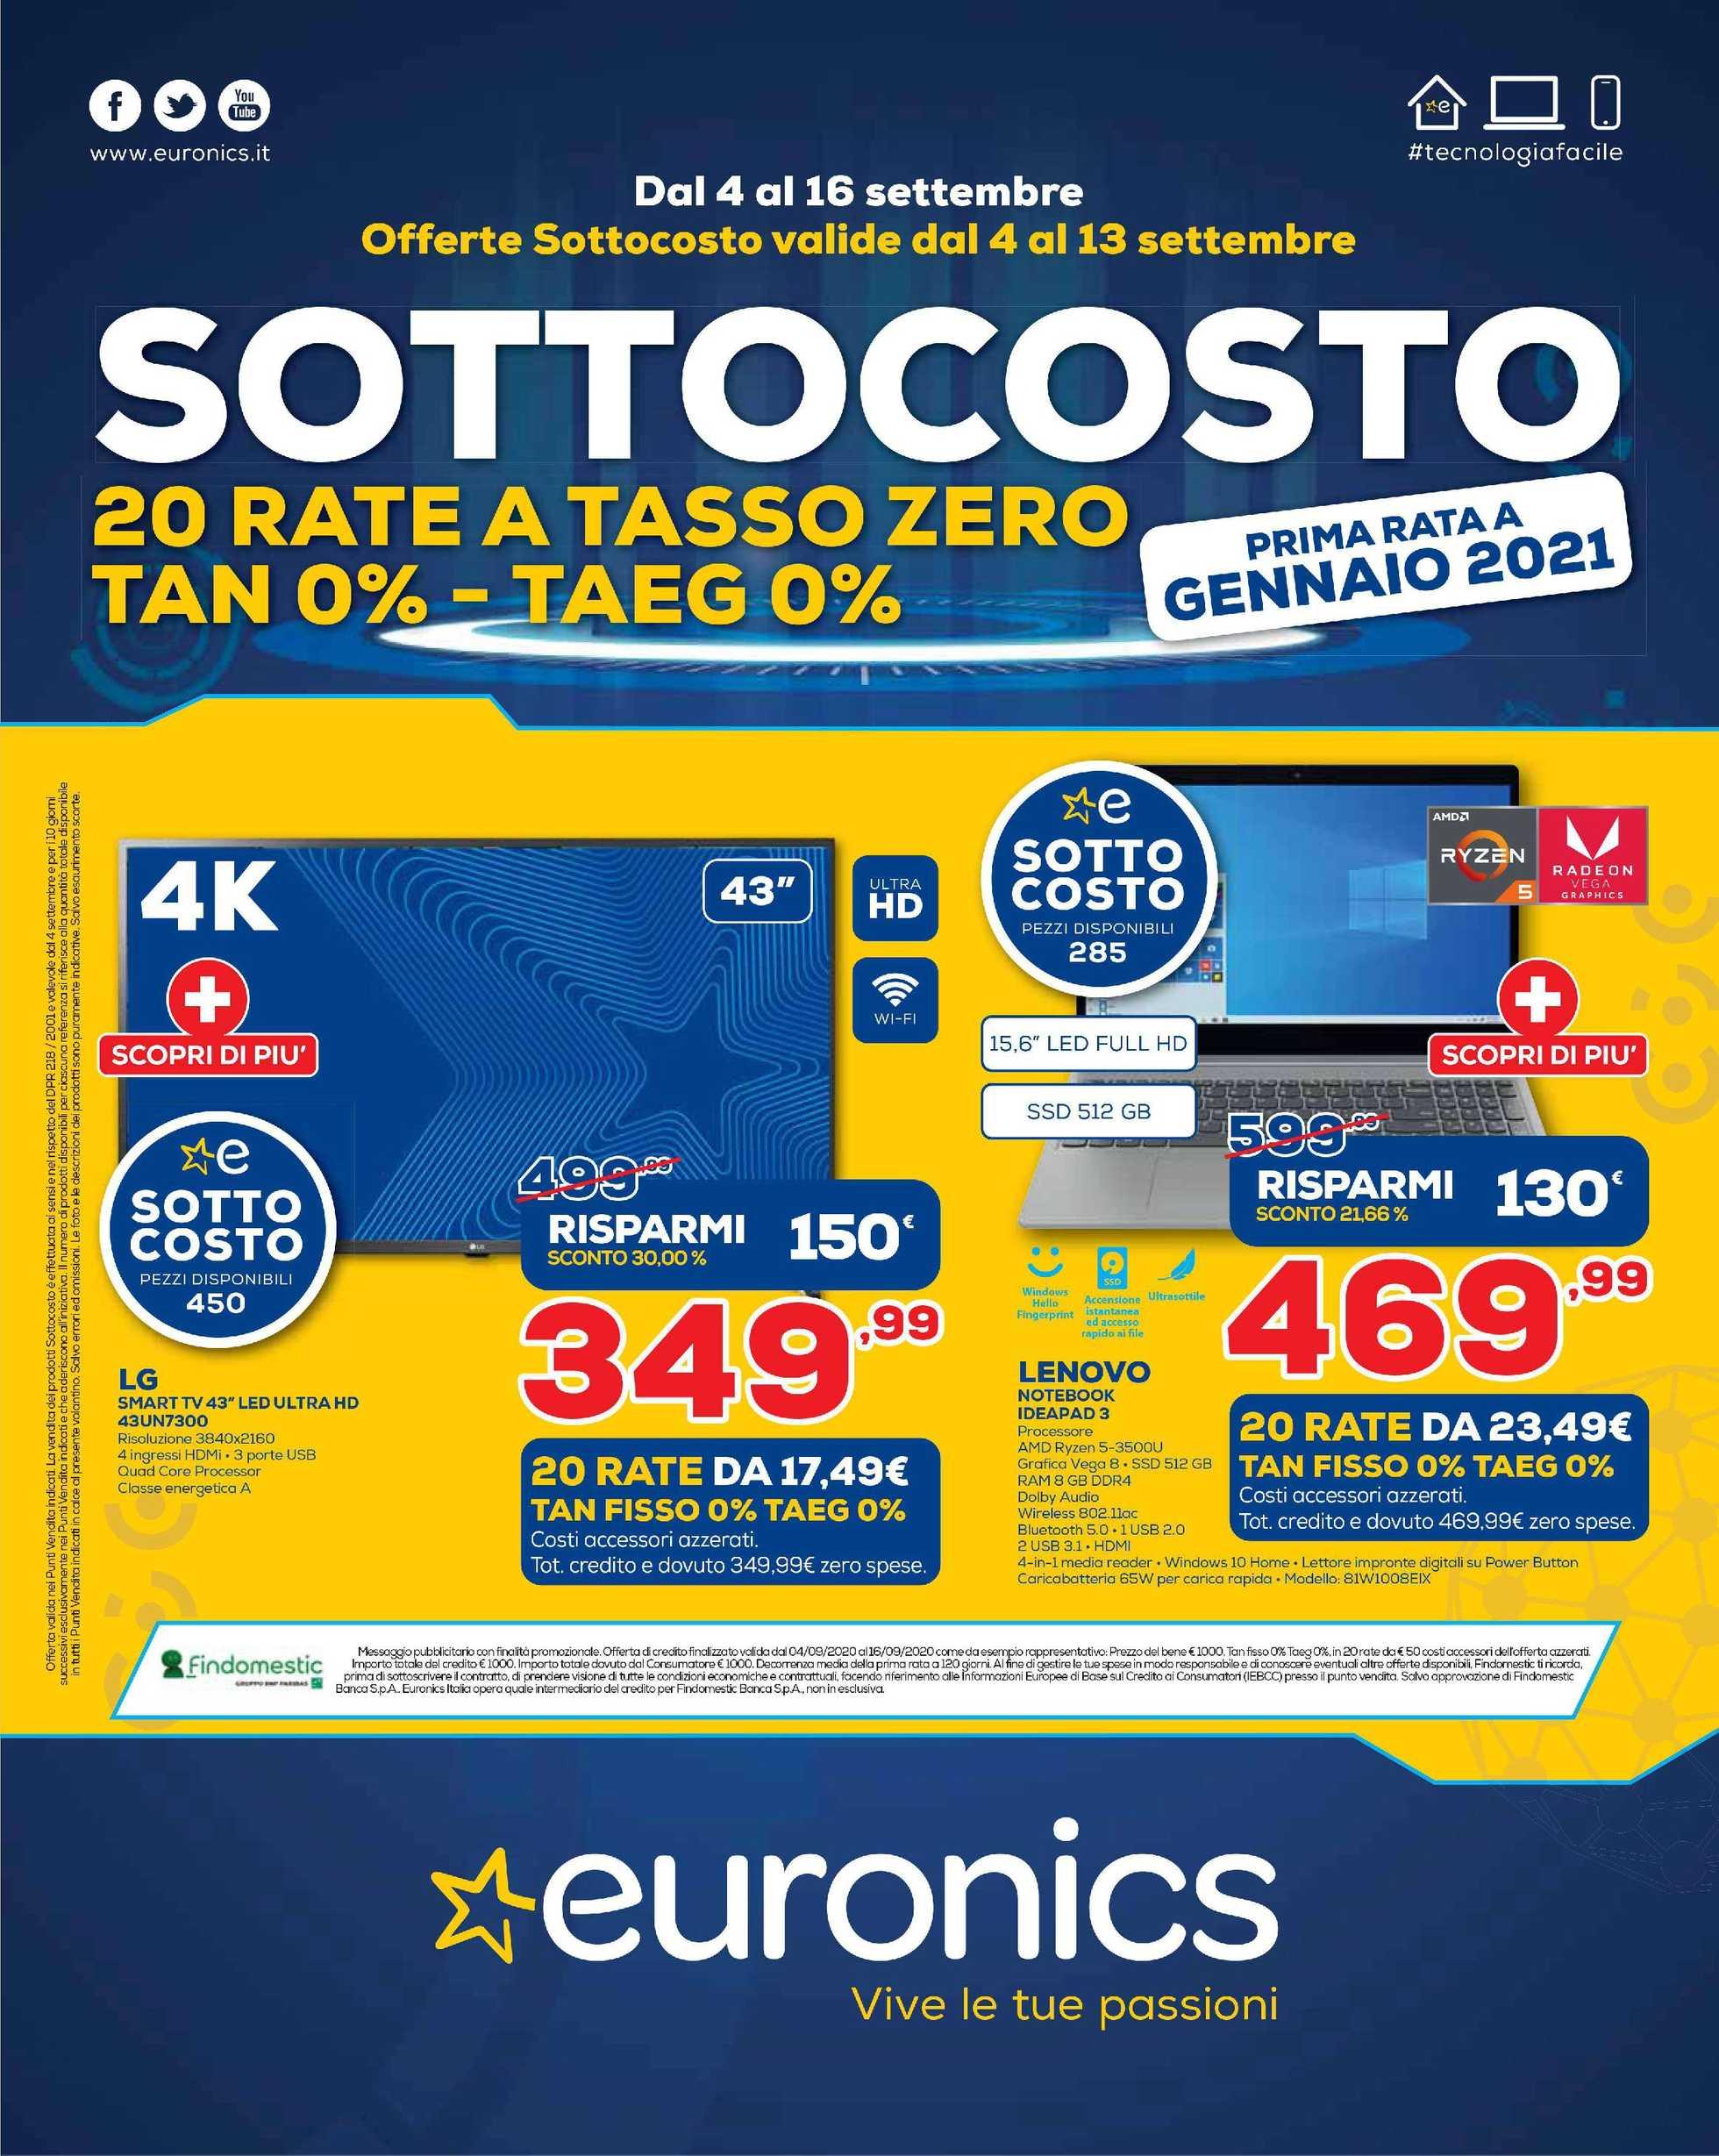 Euronics Bruno - offerte valide dal 04.09.2020 al 16.09.2020 - pagina 1.